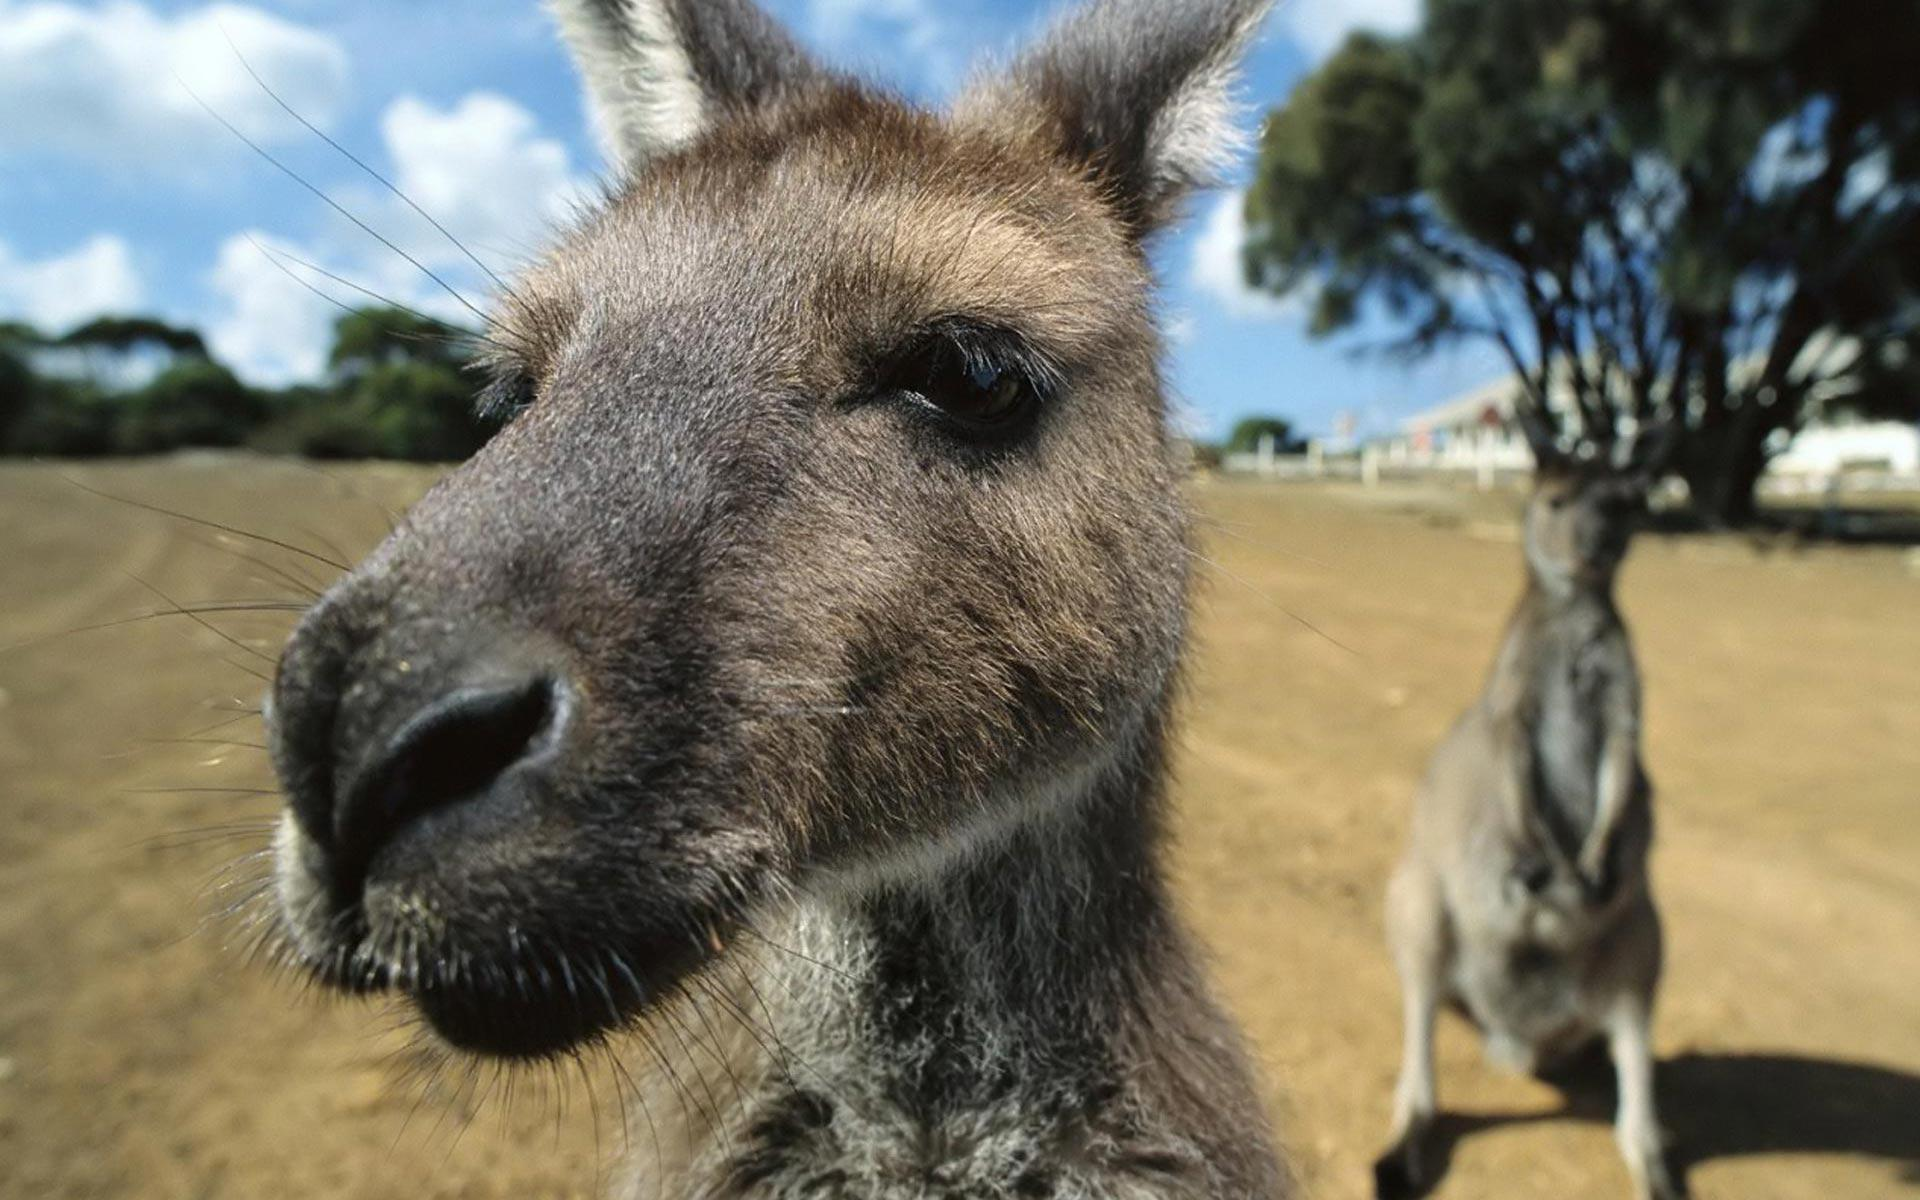 Kangaroo-HD-Wallpaper-11 - Animals Planent.